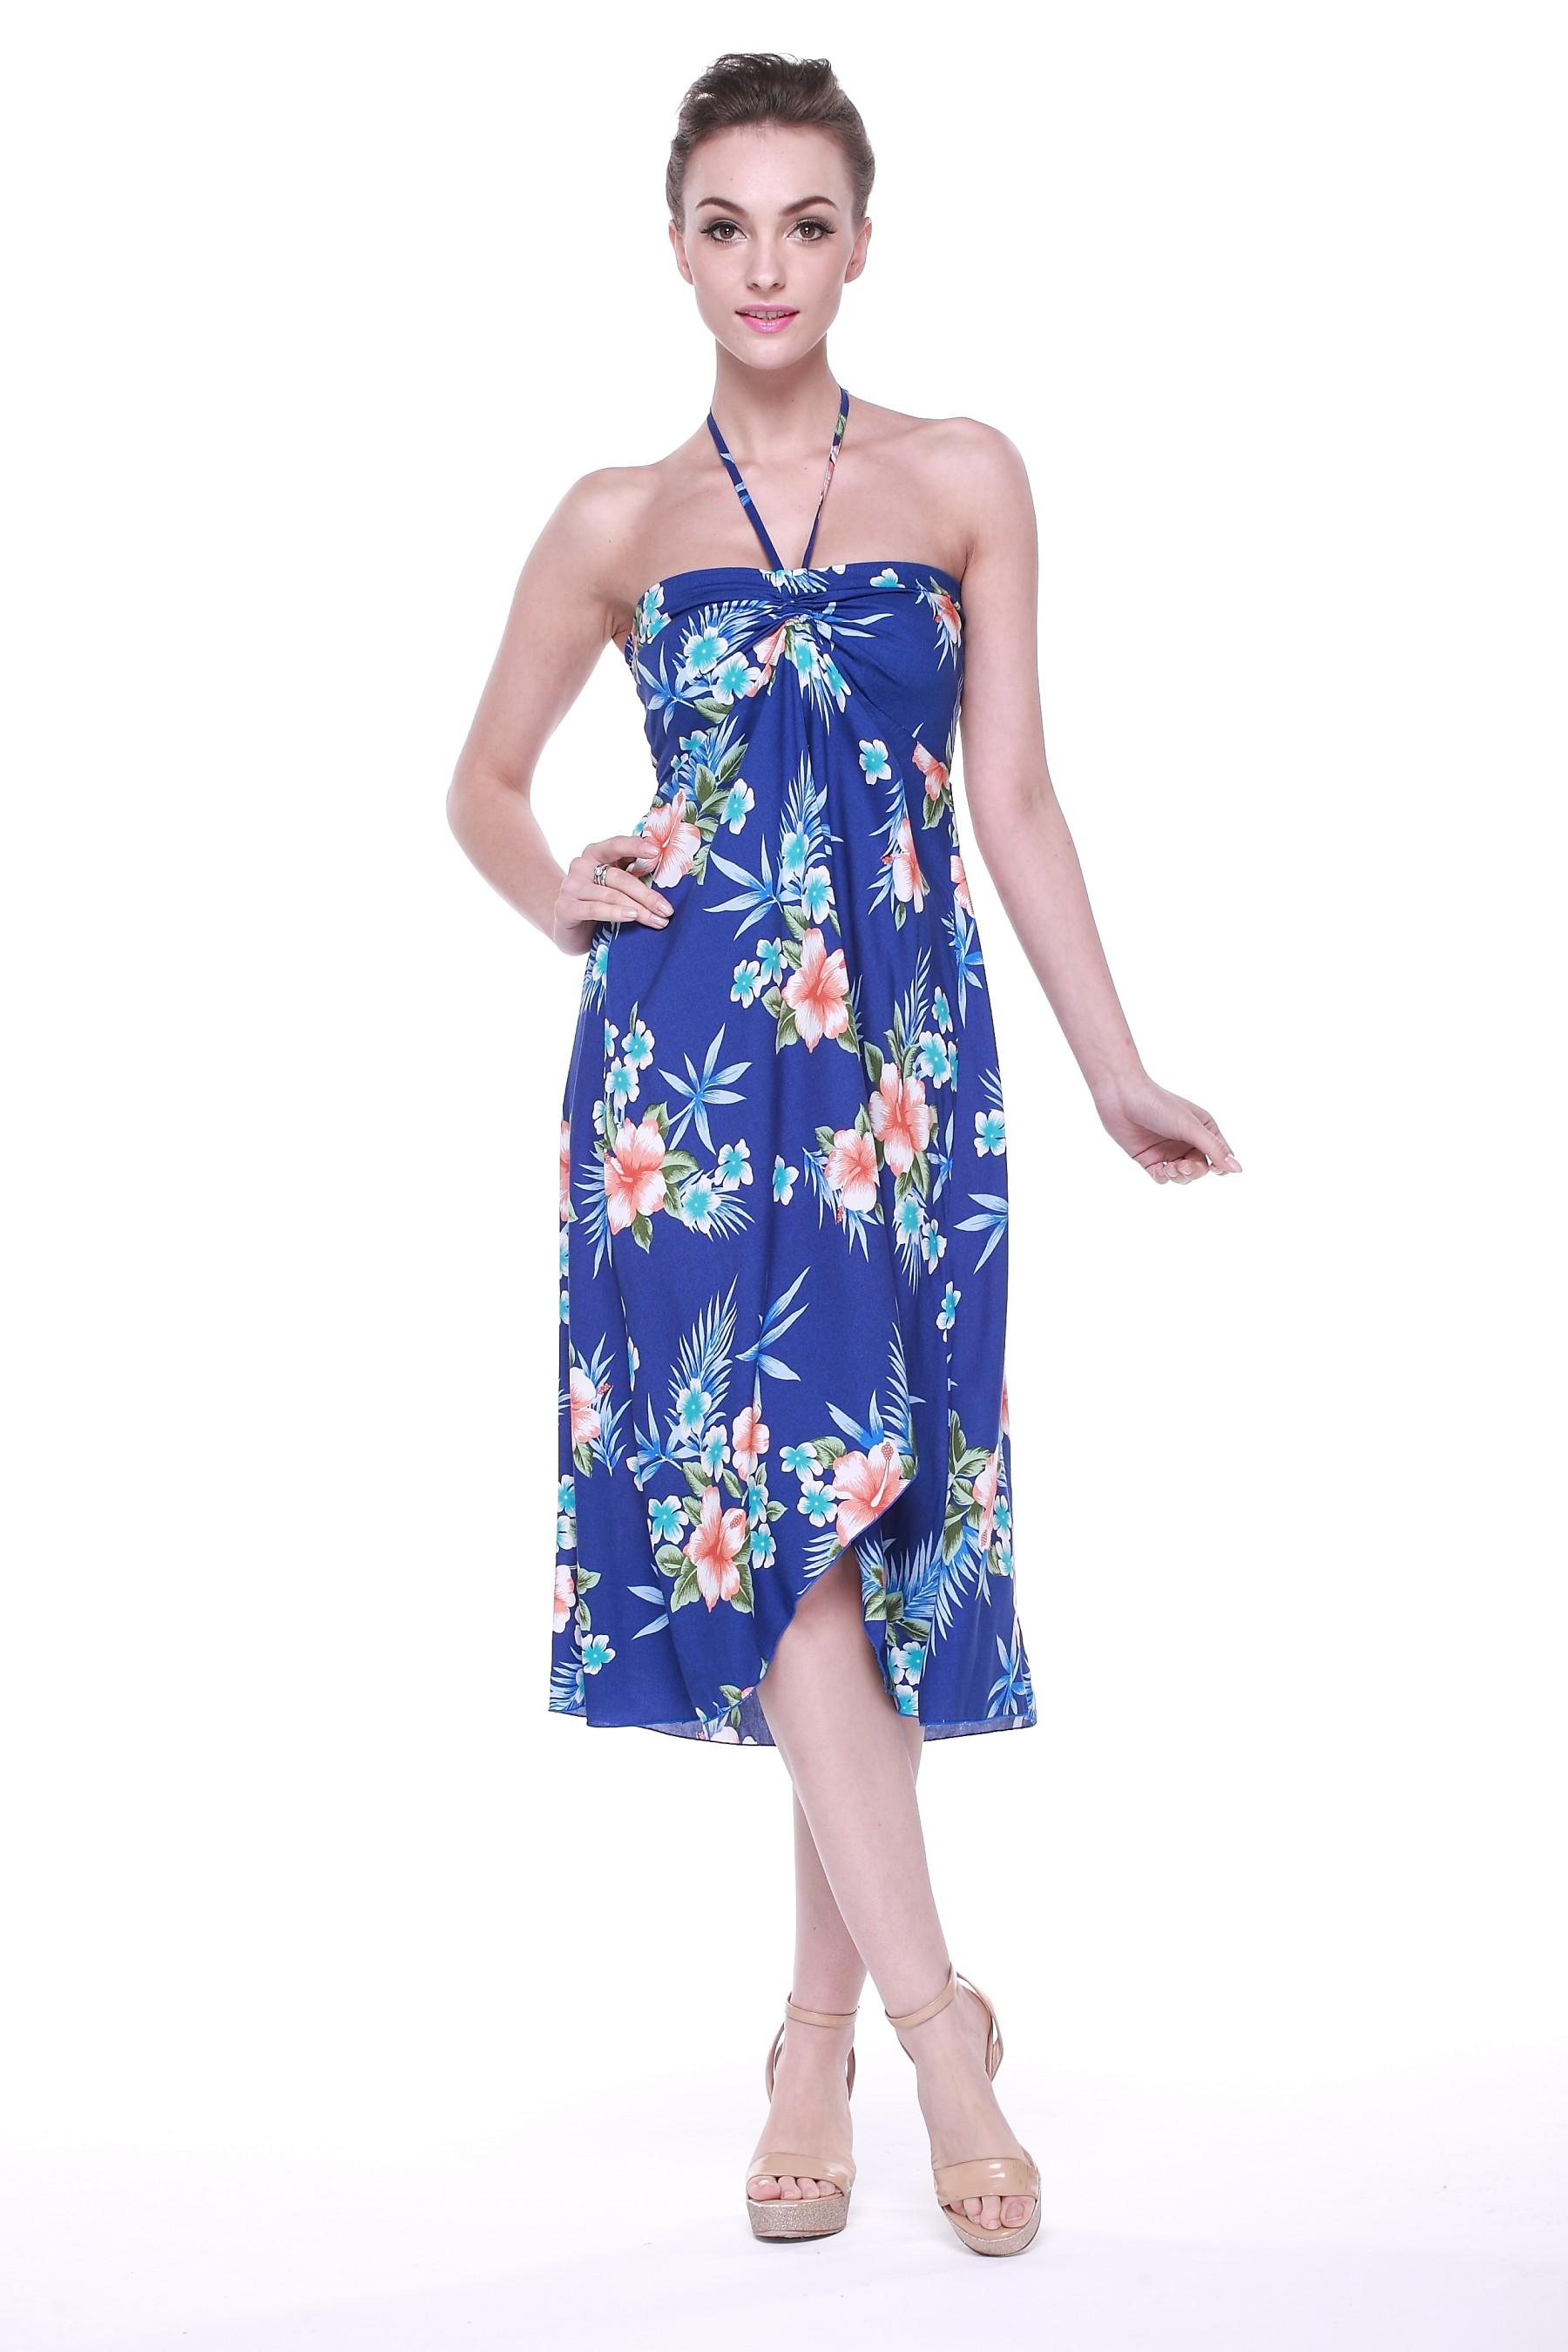 butterfly hawaiian dress in hibiscus blue YUQYGJQ